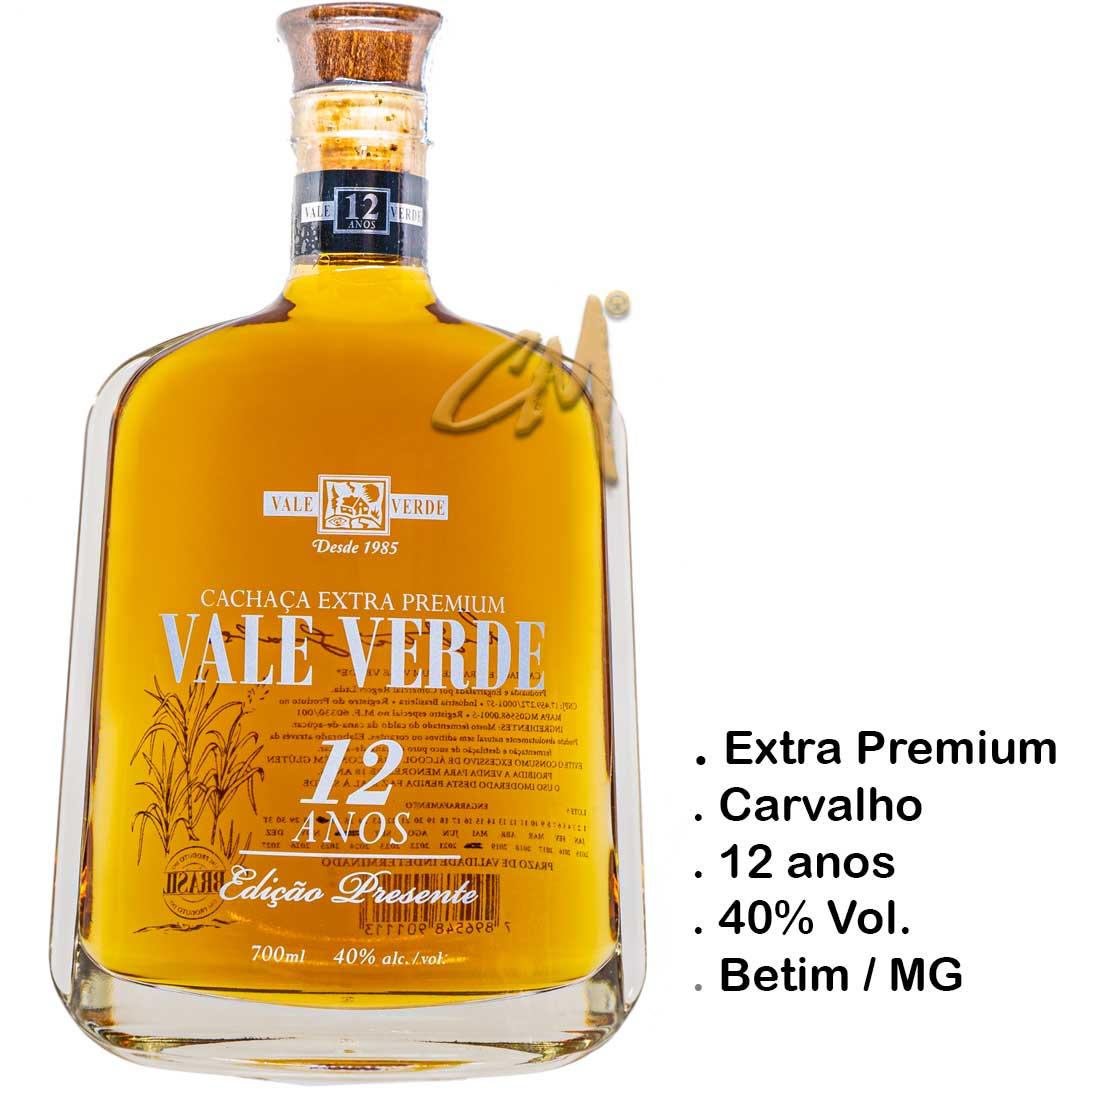 Cachaça Vale Verde Extra Premium 12 anos (Betim - MG)